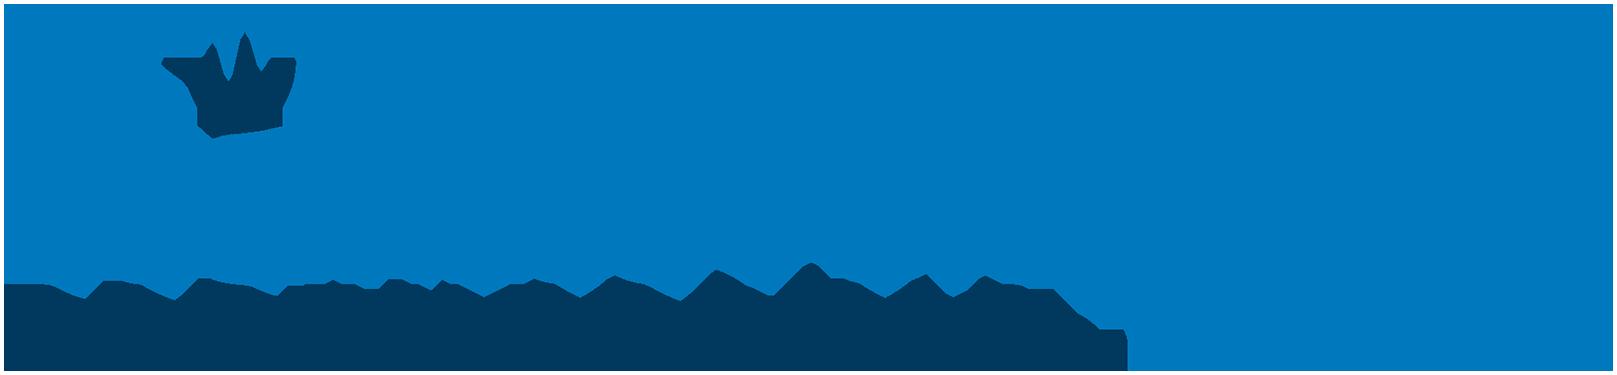 Global Business for Health Partnership